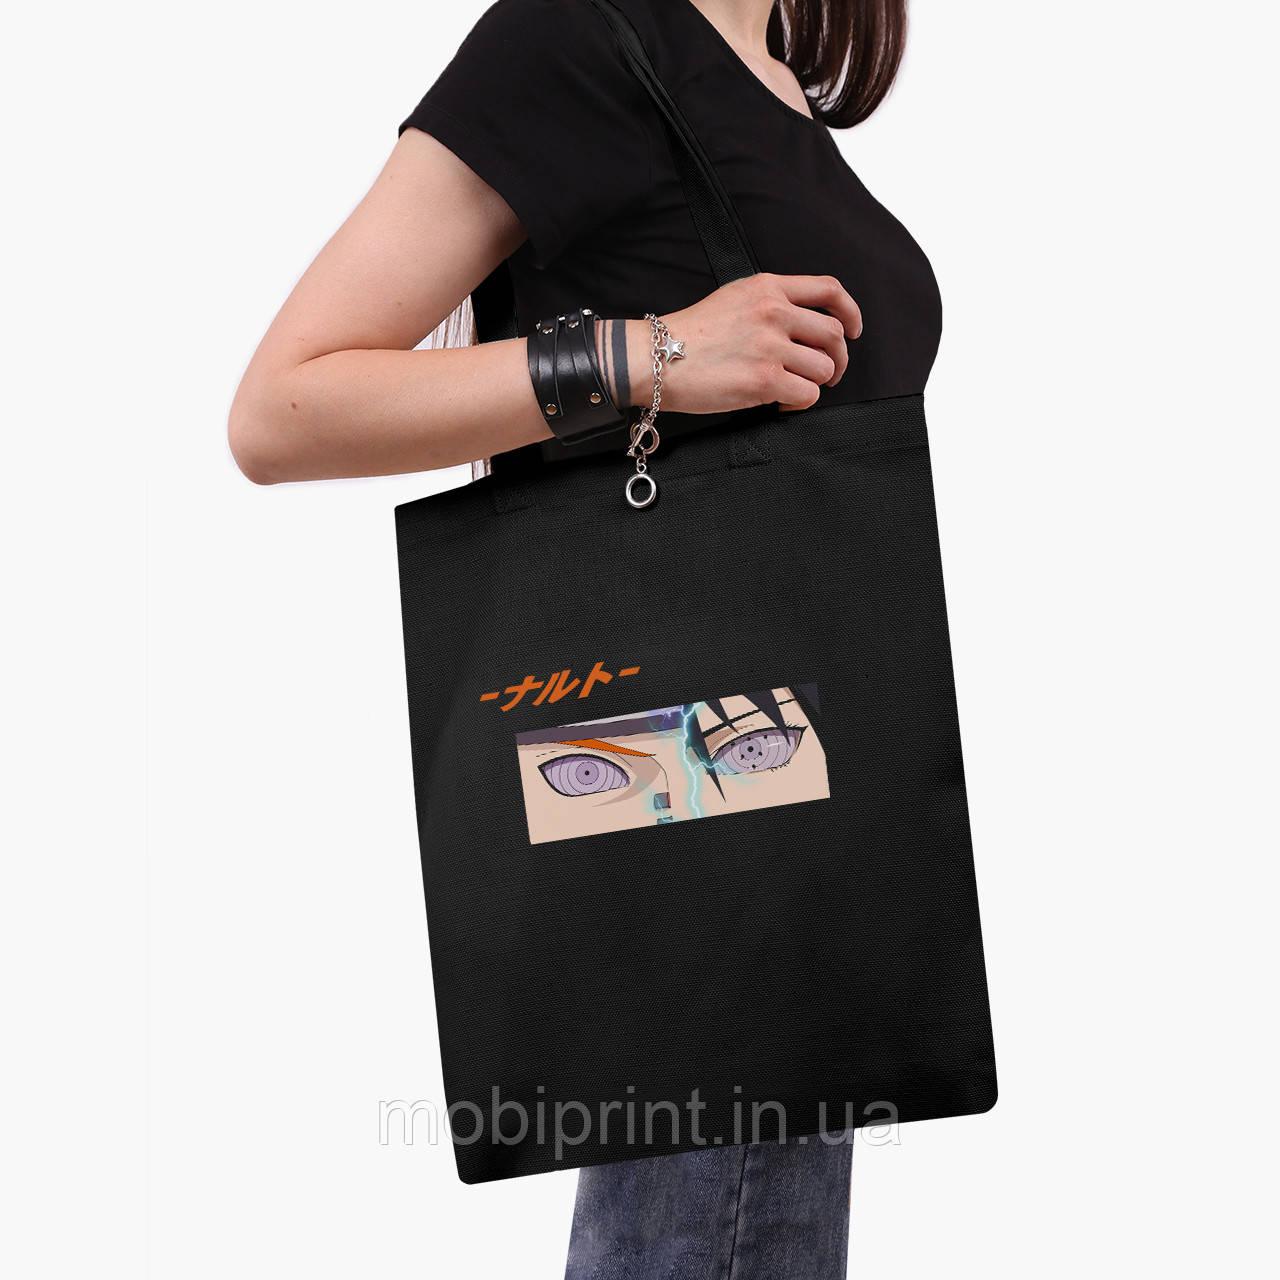 Эко сумка шоппер черная Наруто Узумаки и Саске Учиха (Naruto Uzumaki and Sasuke Uchiha) (9227-2819-2)  41*35